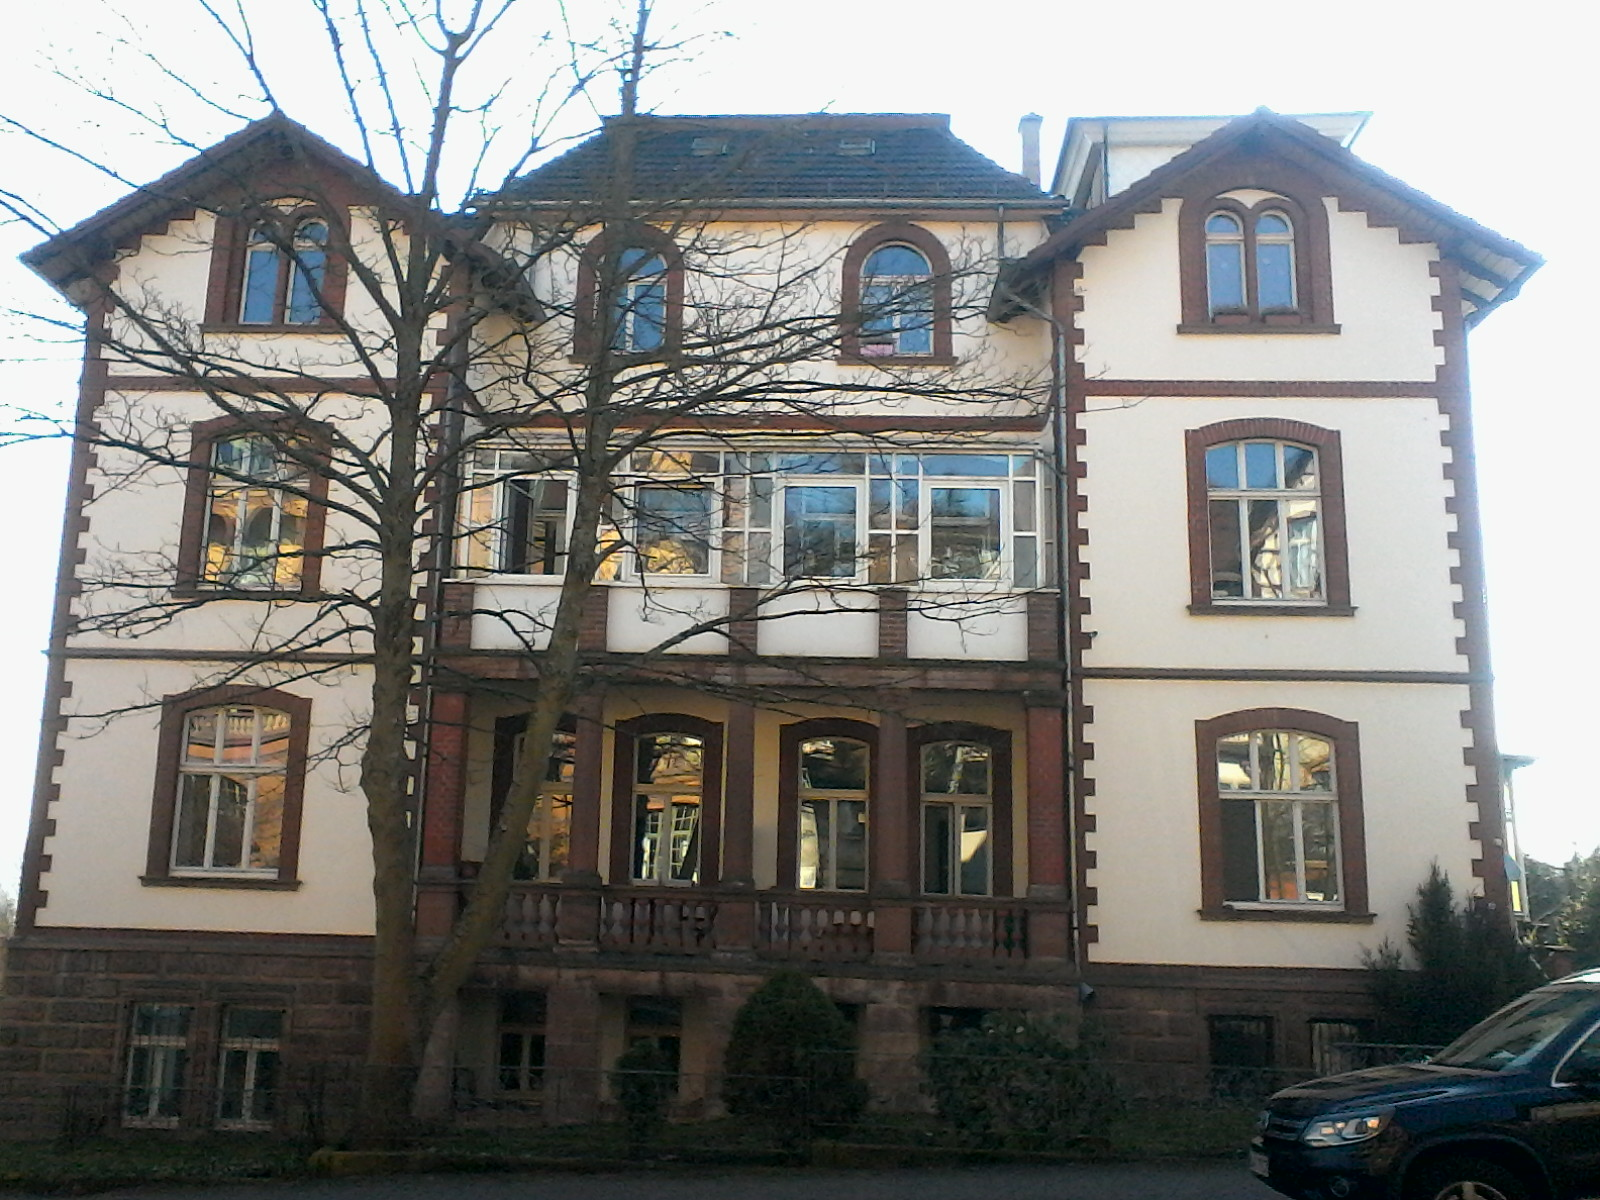 Haus Hufelandstraße 13 Frontal